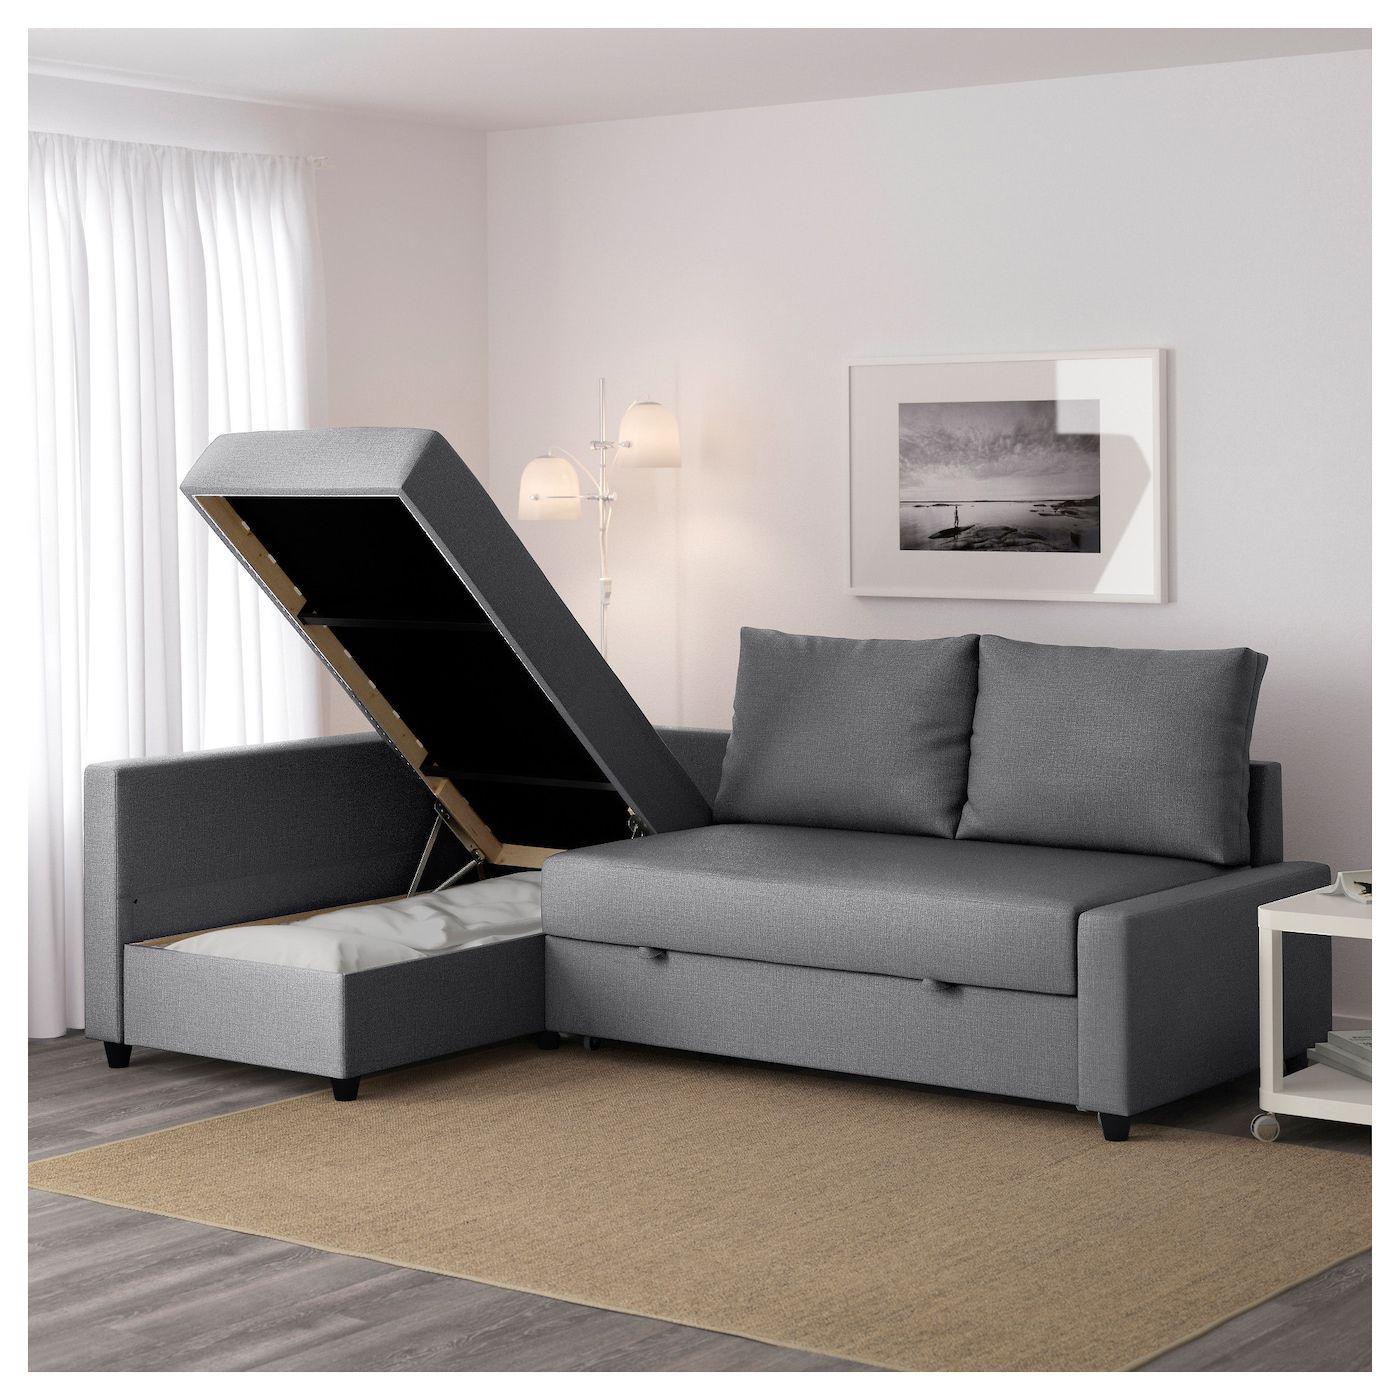 12 Unique Bonus Room Ideas For Your Home Sofa Bed With Storage